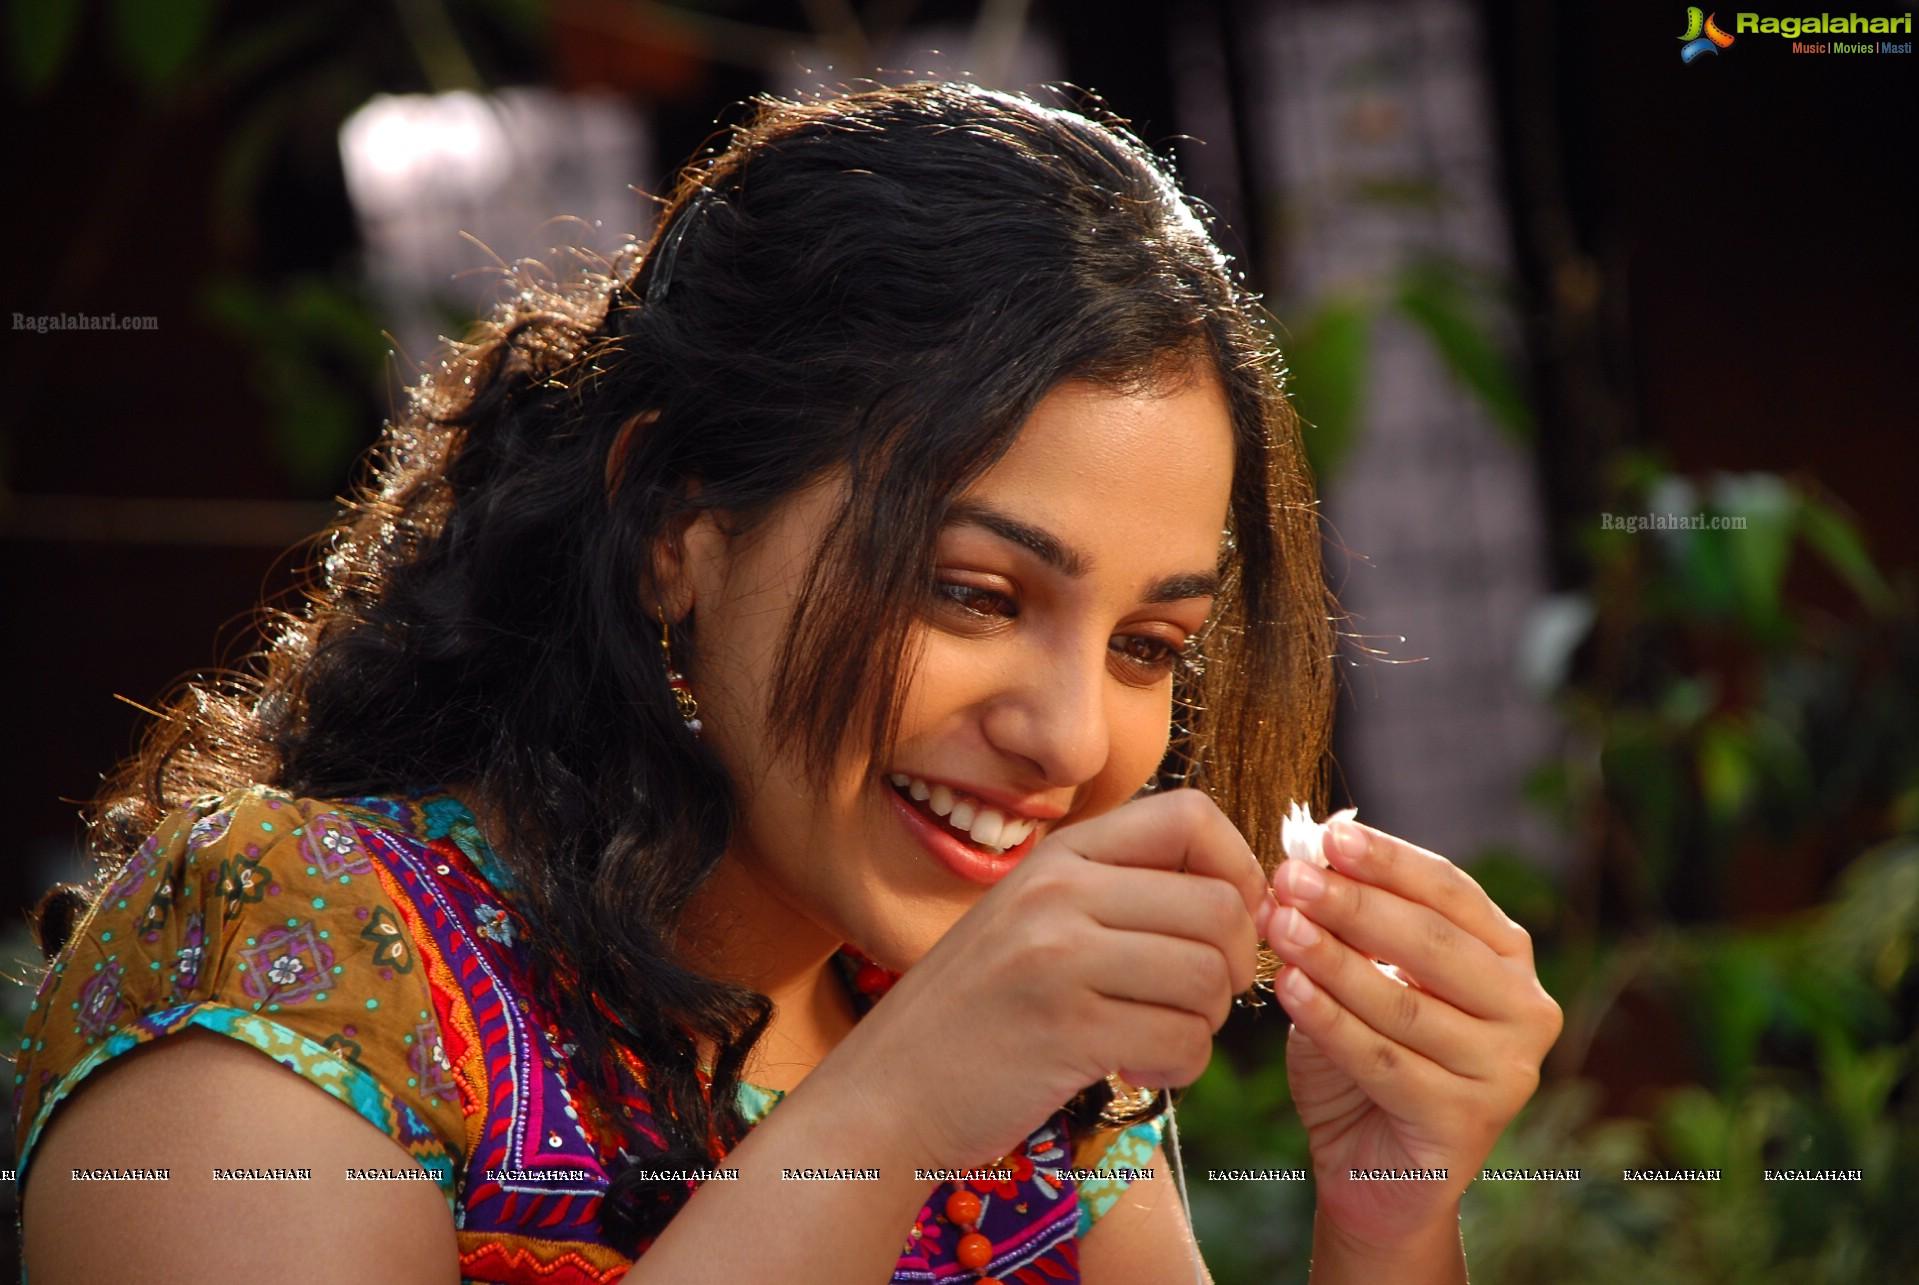 nithya menon (hd) image 4 | telugu heroines gallery,images, photos